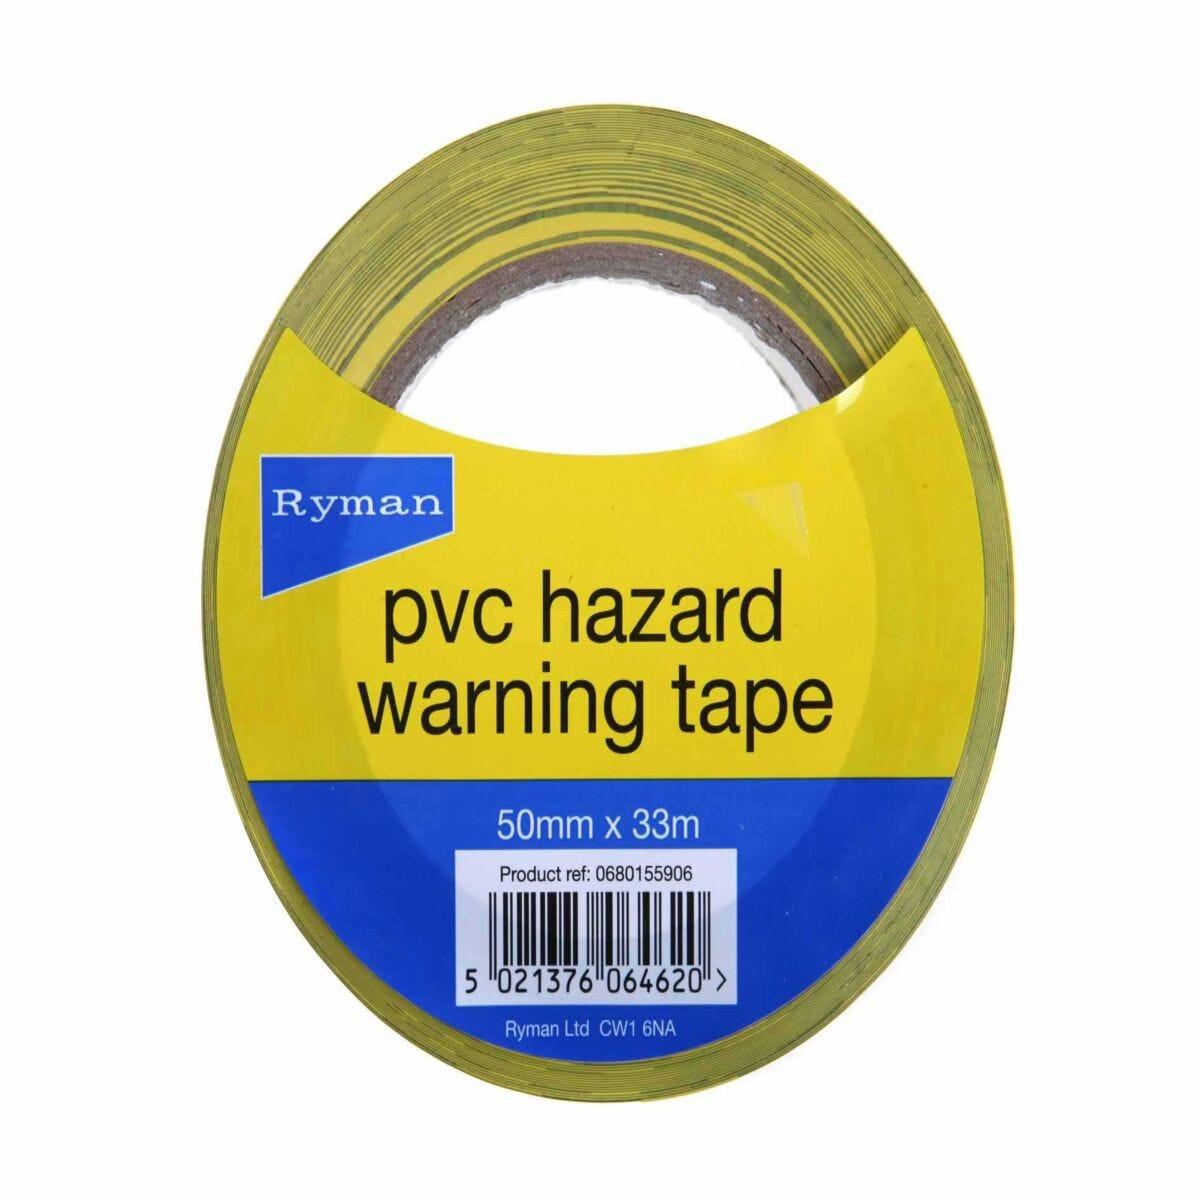 Ryman Hazard Warning Tape Pack of 3 50mmx33m